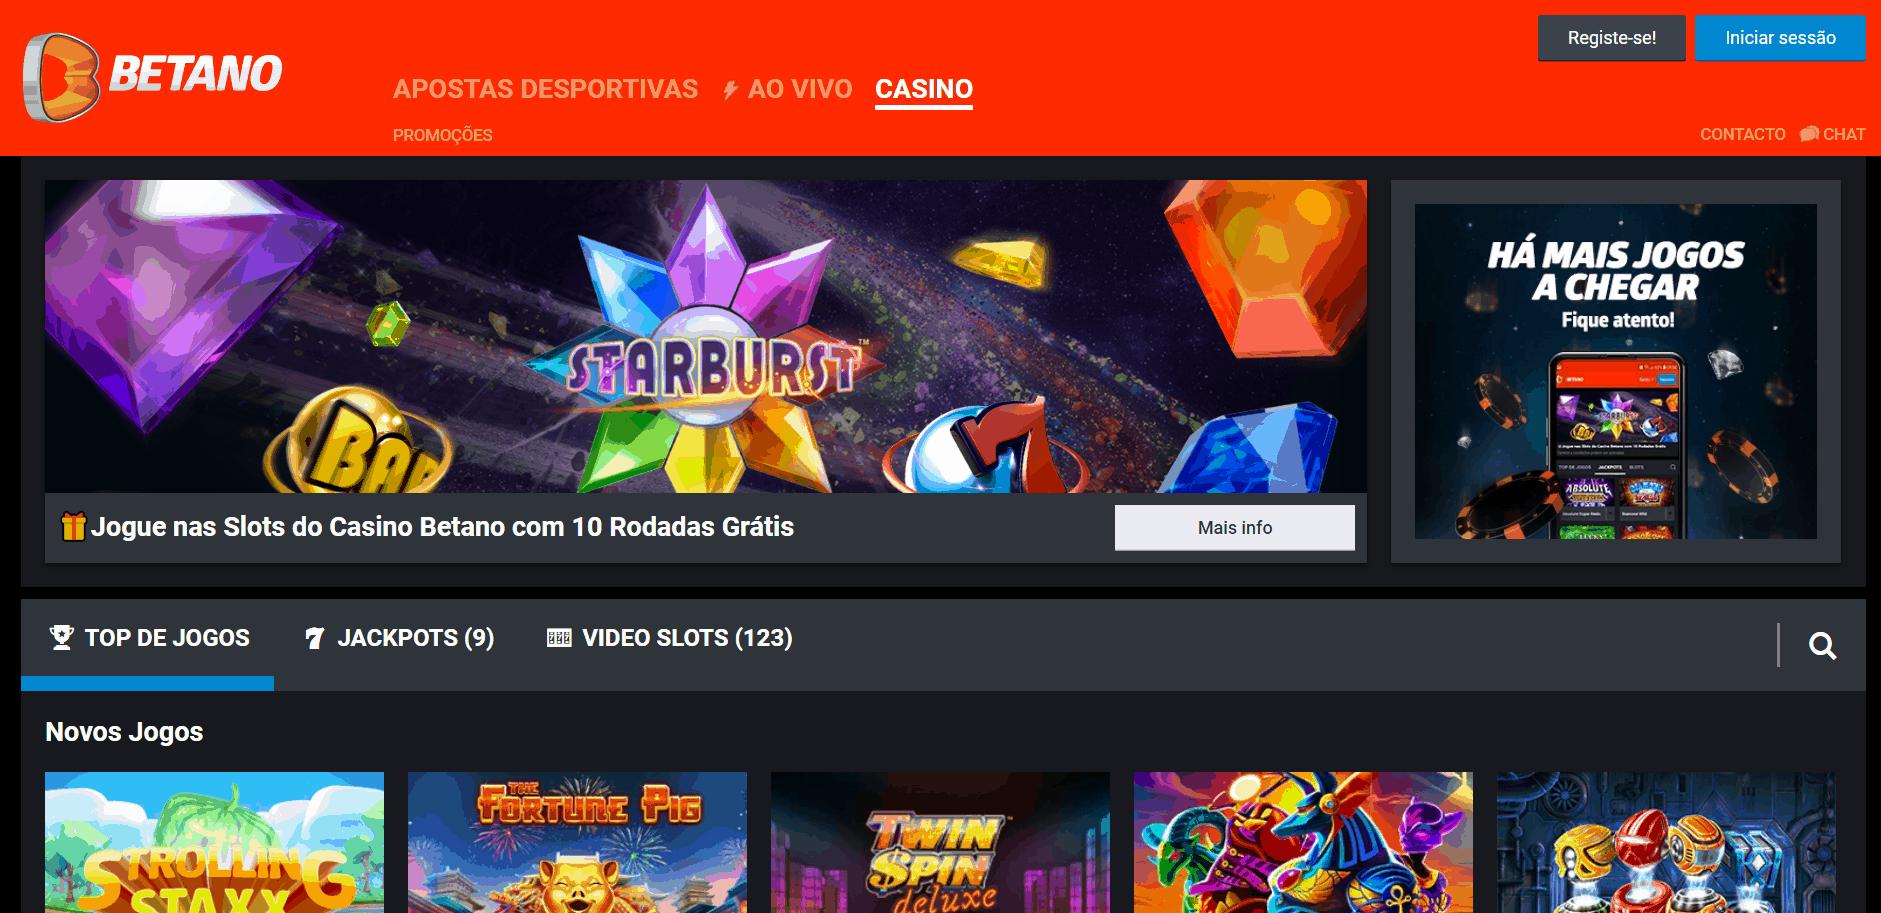 Betano desktop